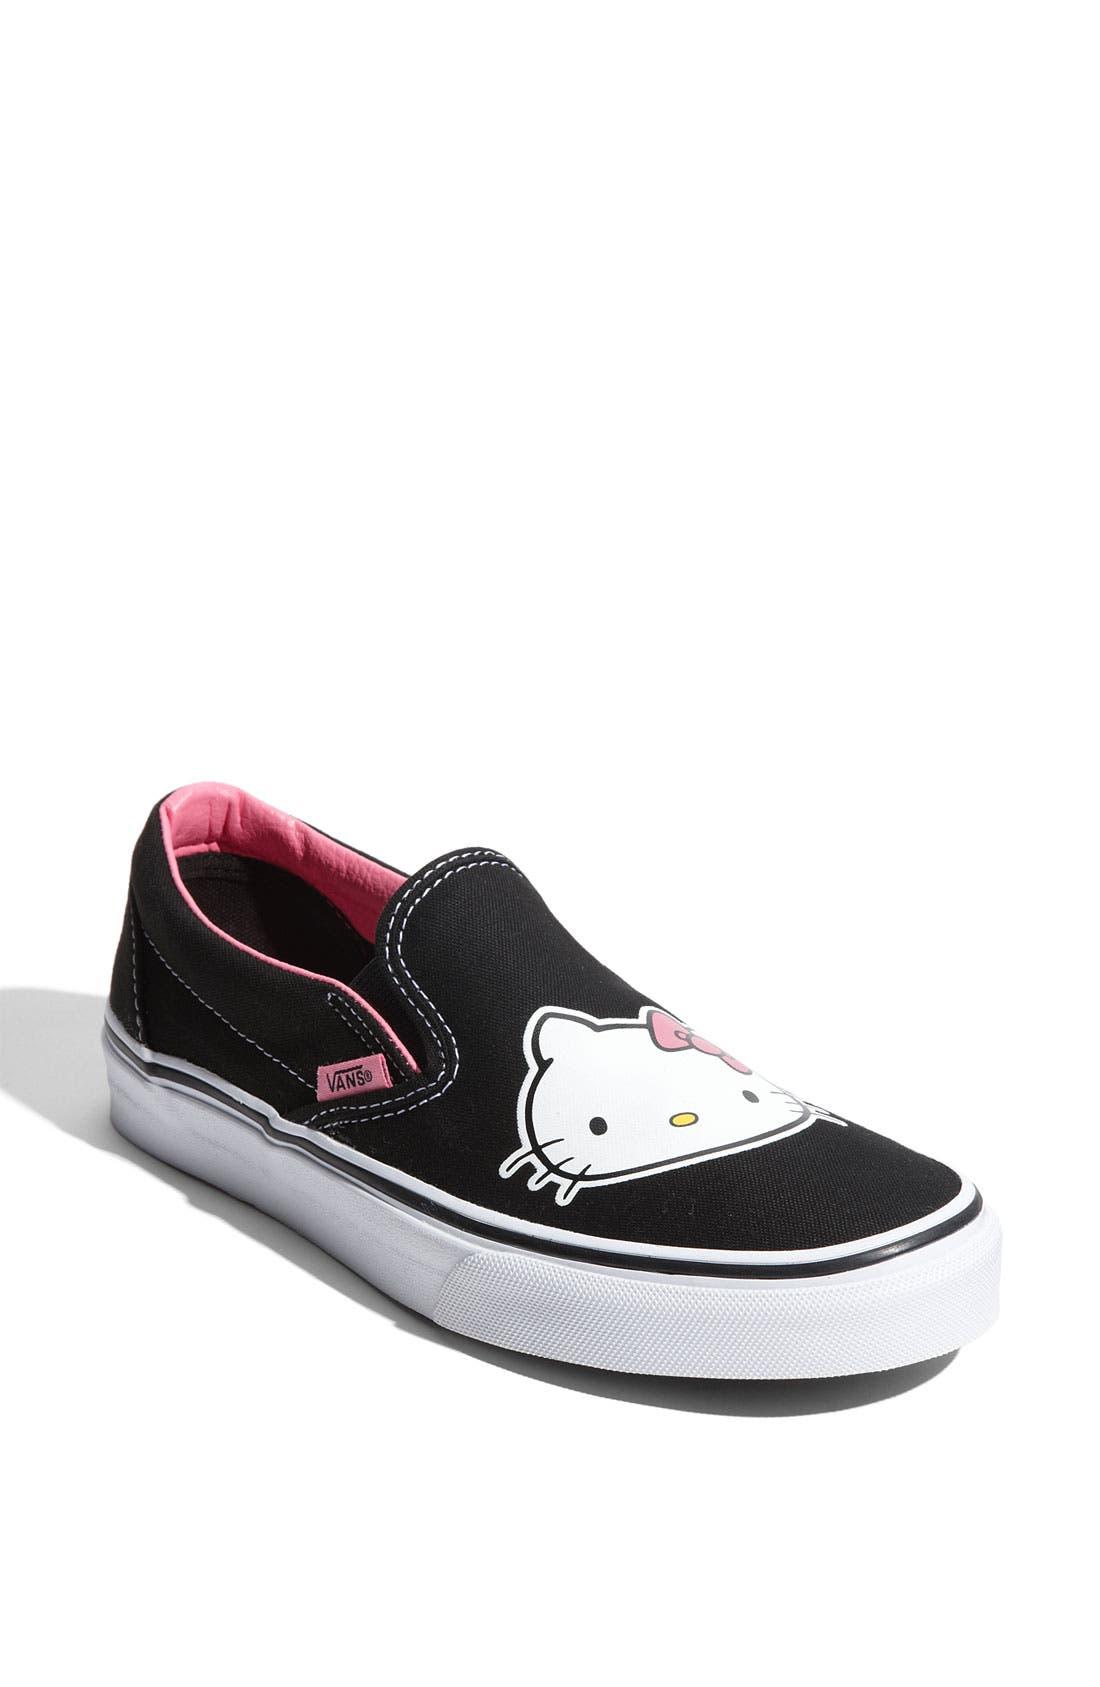 Alternate Image 1 Selected - Vans 'Hello Kitty®' Slip-On Sneaker (Women) (Limited Edition)